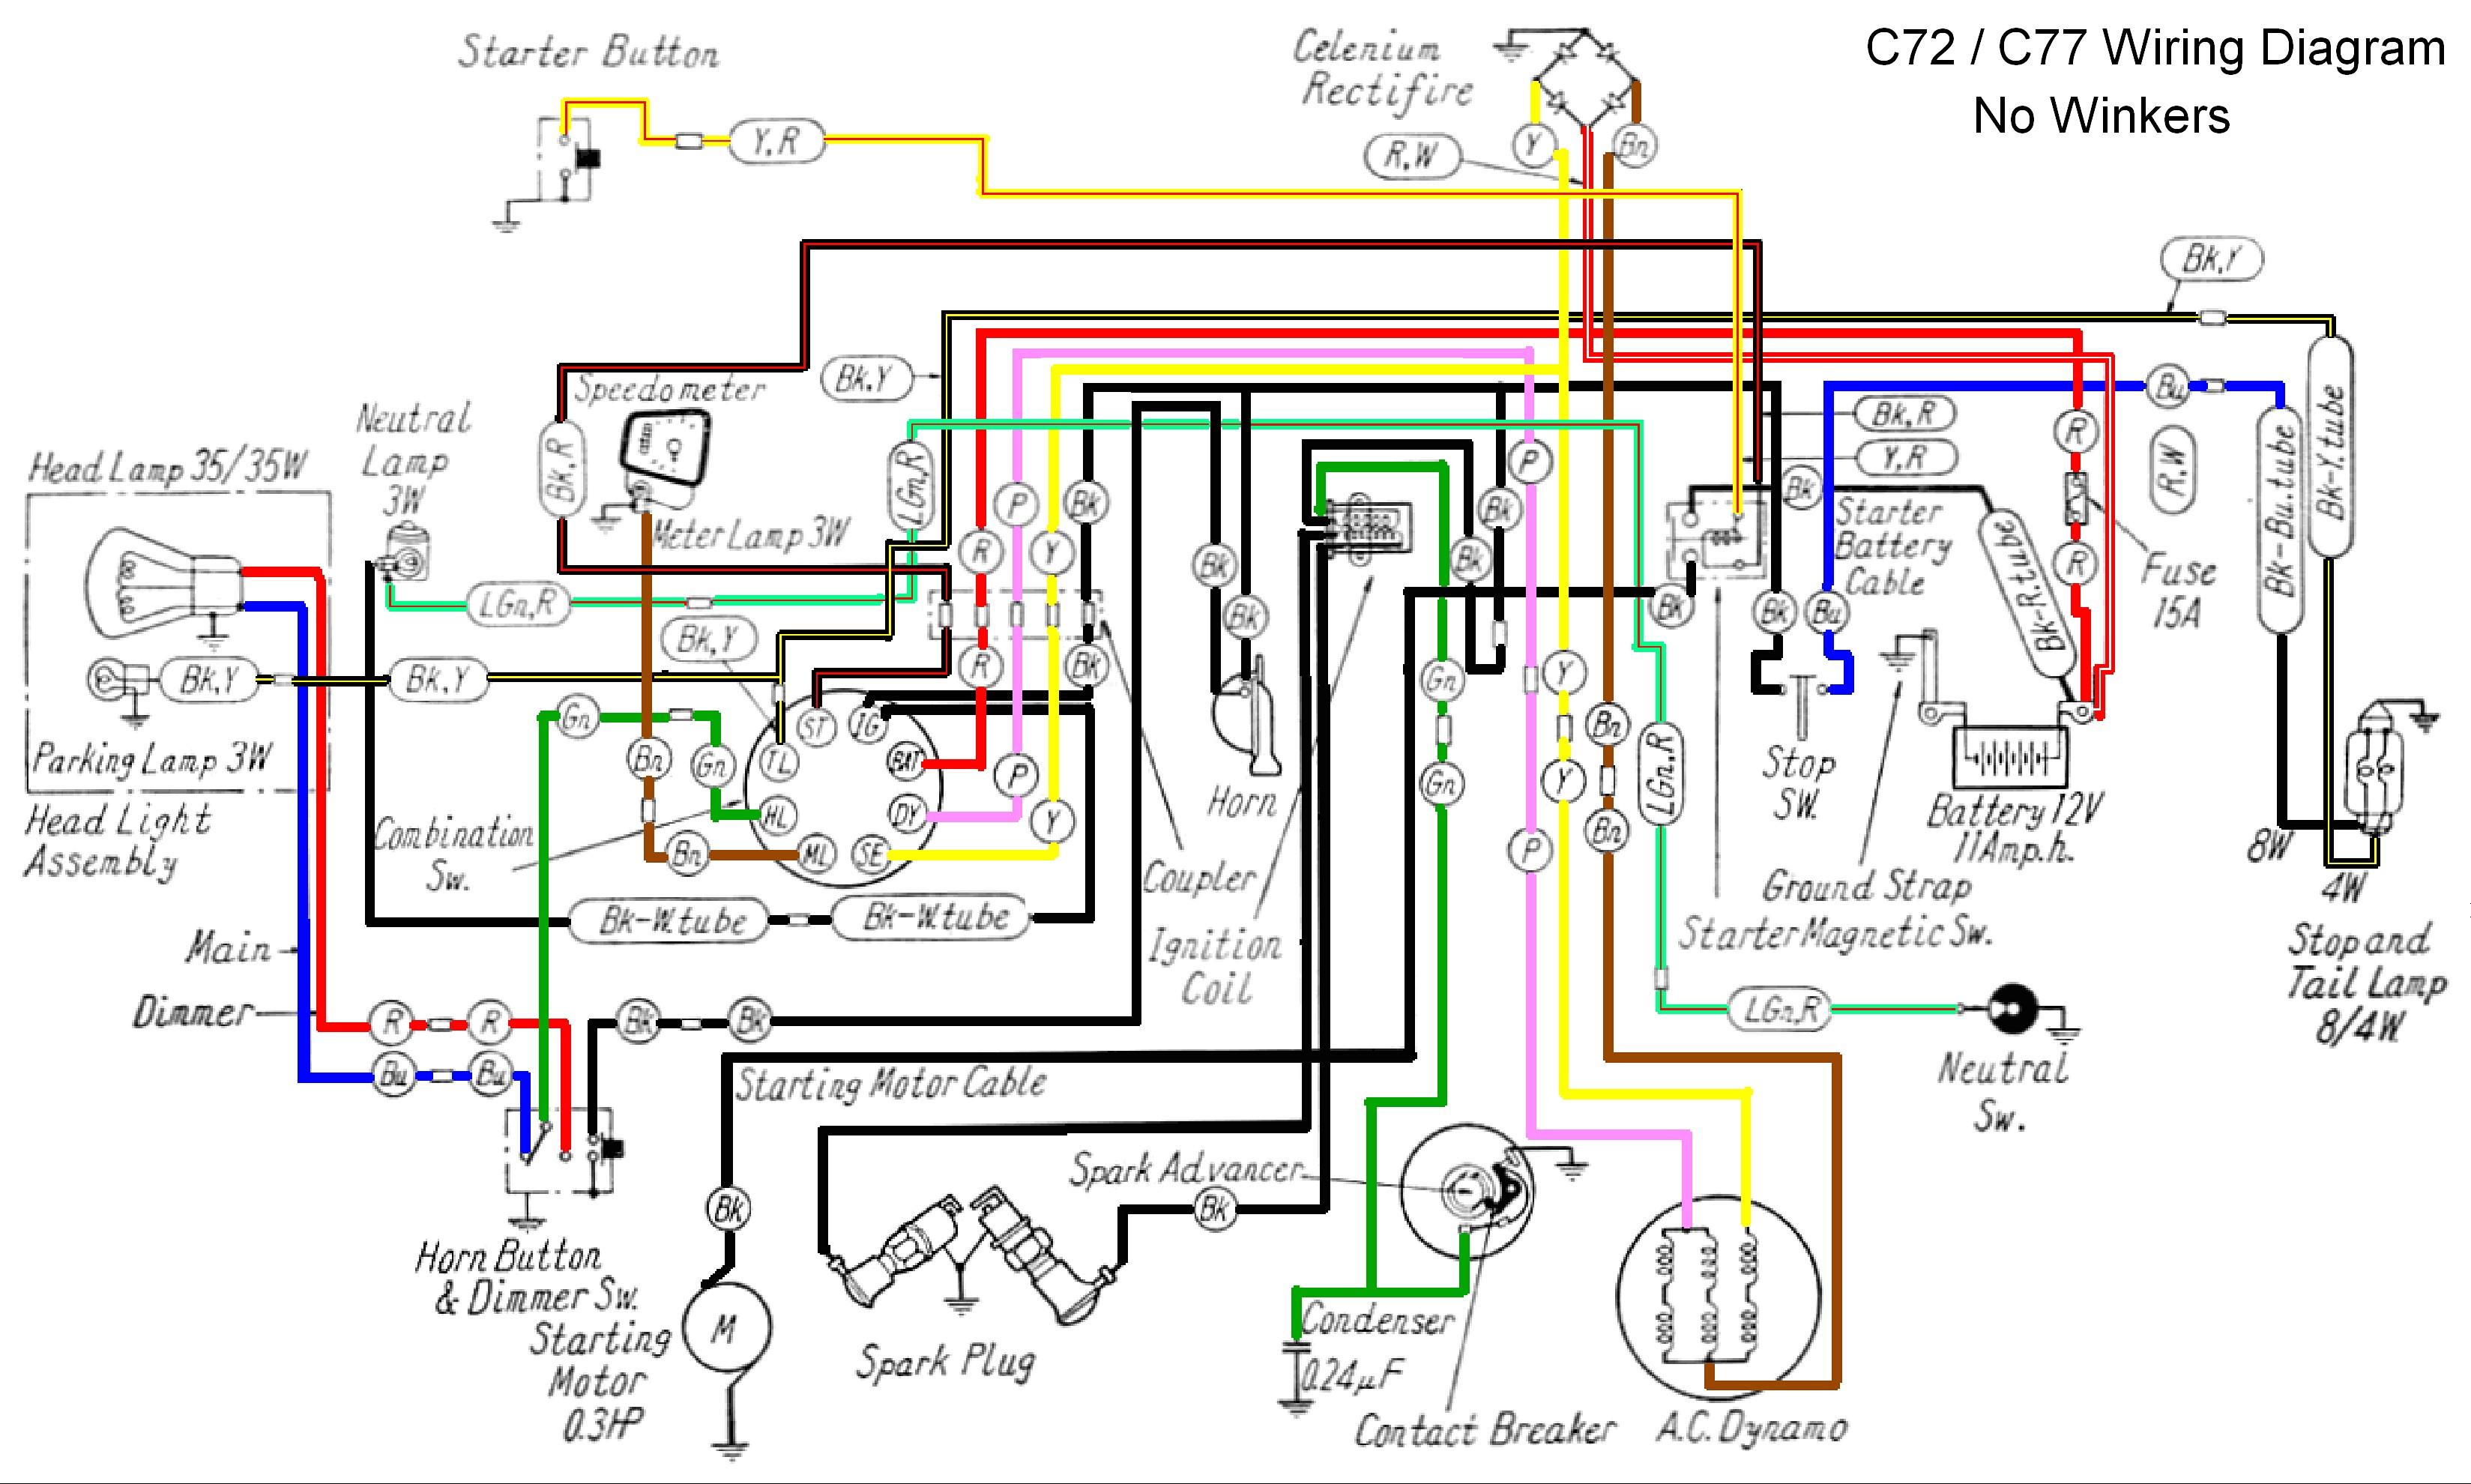 Honda Xr200 Wiring Harness Diagram - share circuit diagrams on